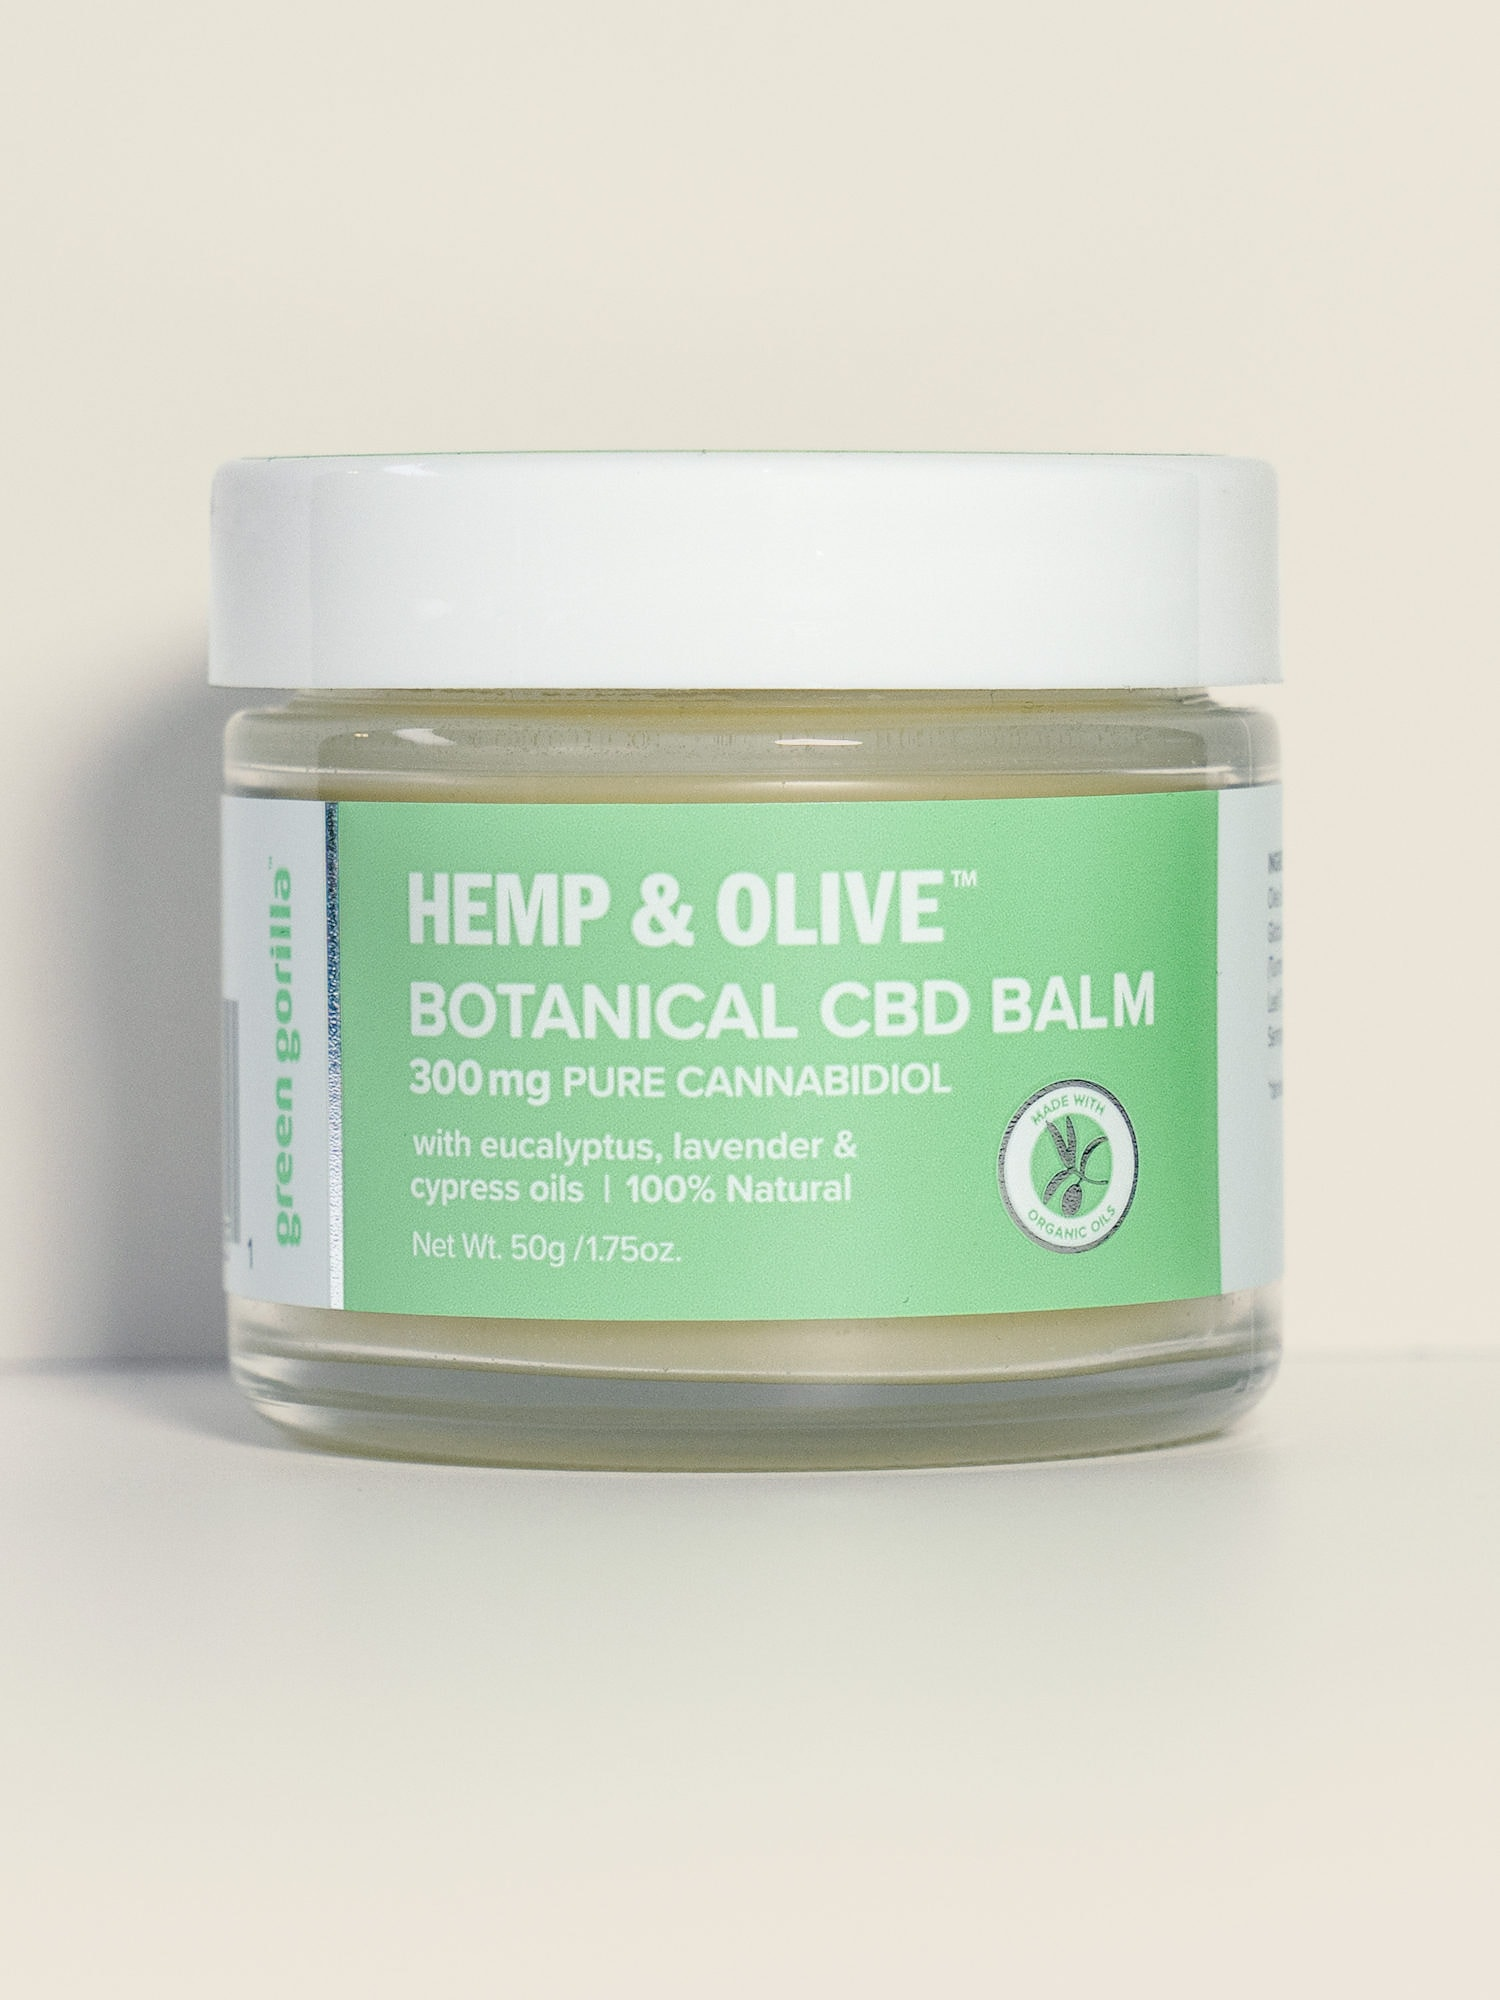 Hemp & Olive Botanical CBD Balm - 300mg | Green Gorilla